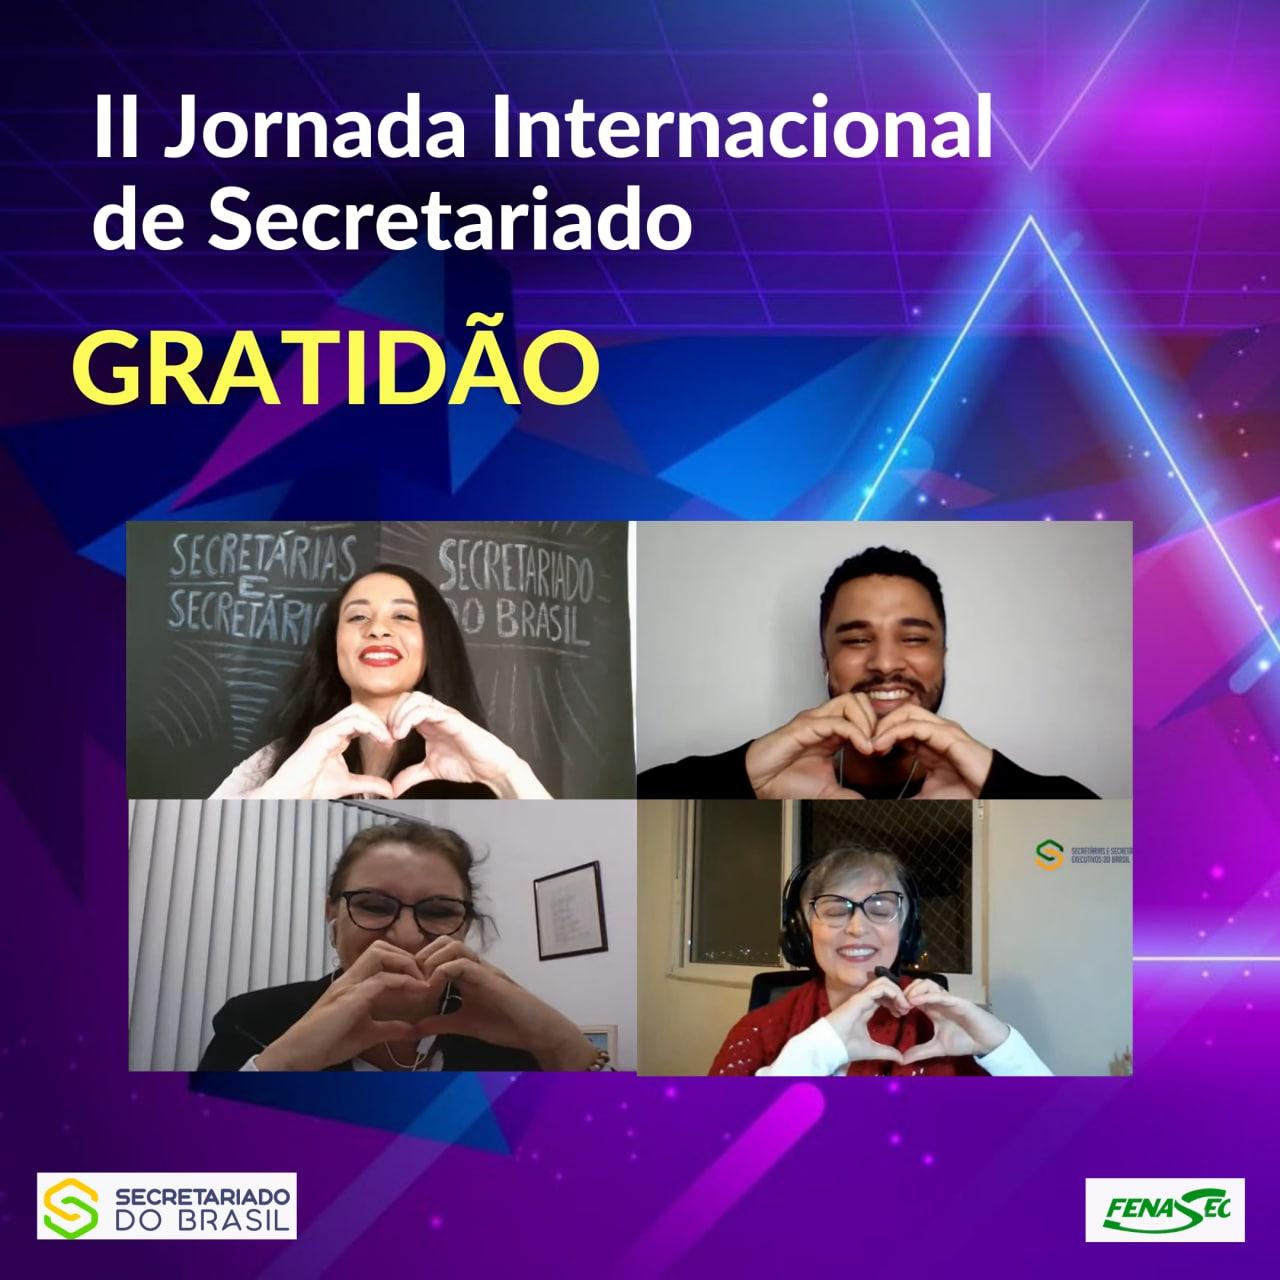 II_jornada_internacional_de_secretariado_dia_4_2